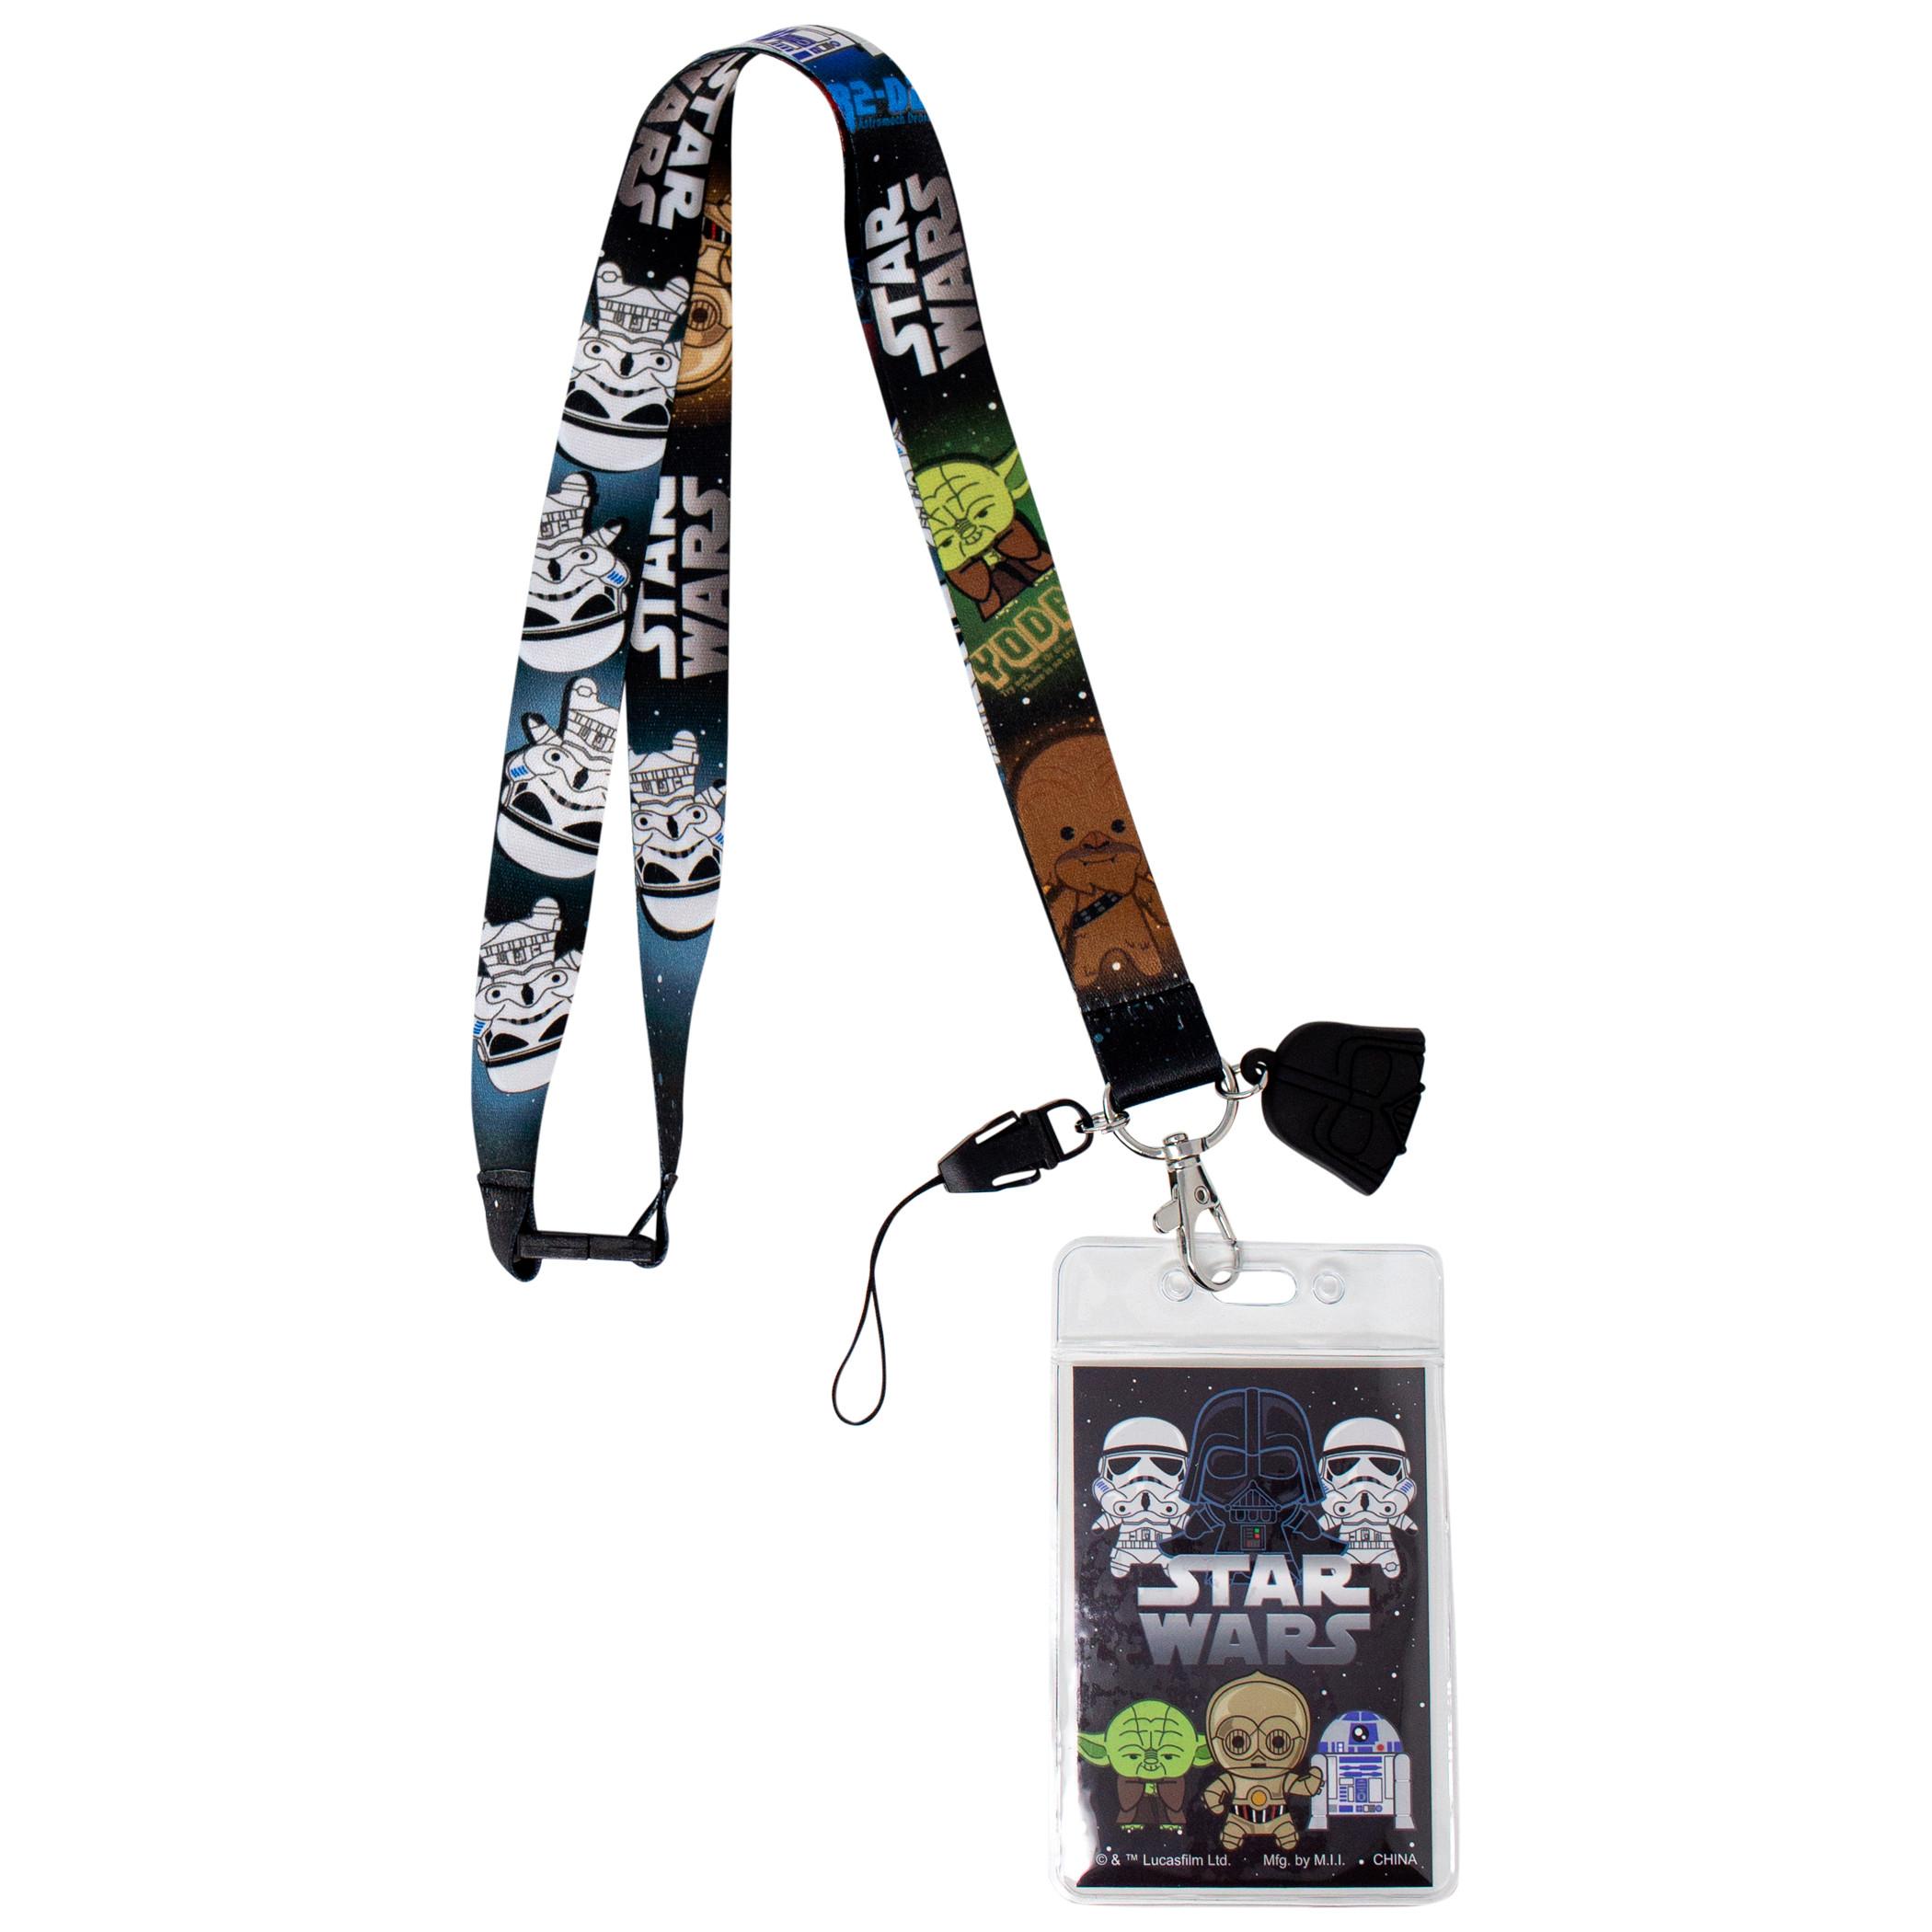 Star Wars Darth Vader Lanyard with ID Badge Holder and Dangle